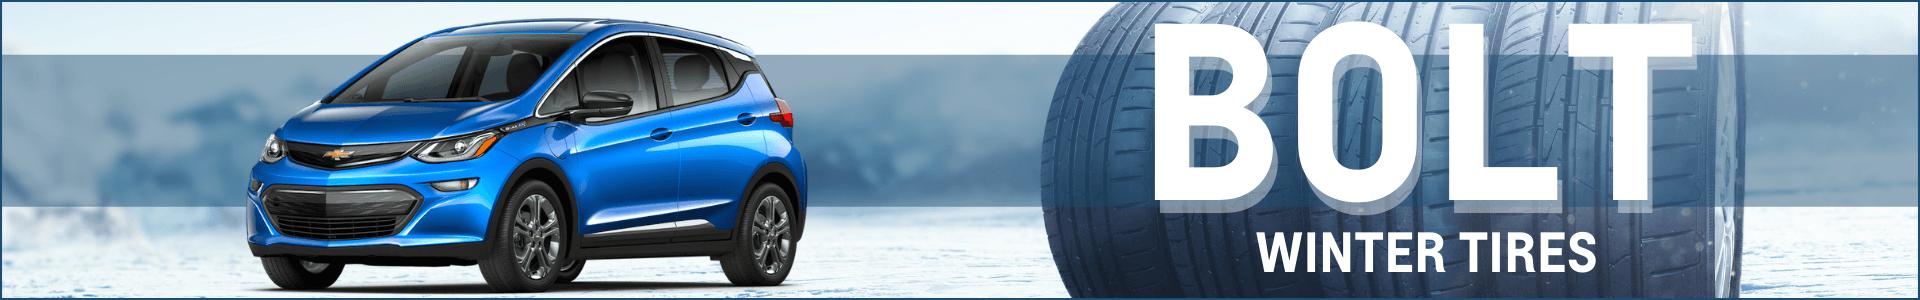 Bolt winter tire deals in Oshawa